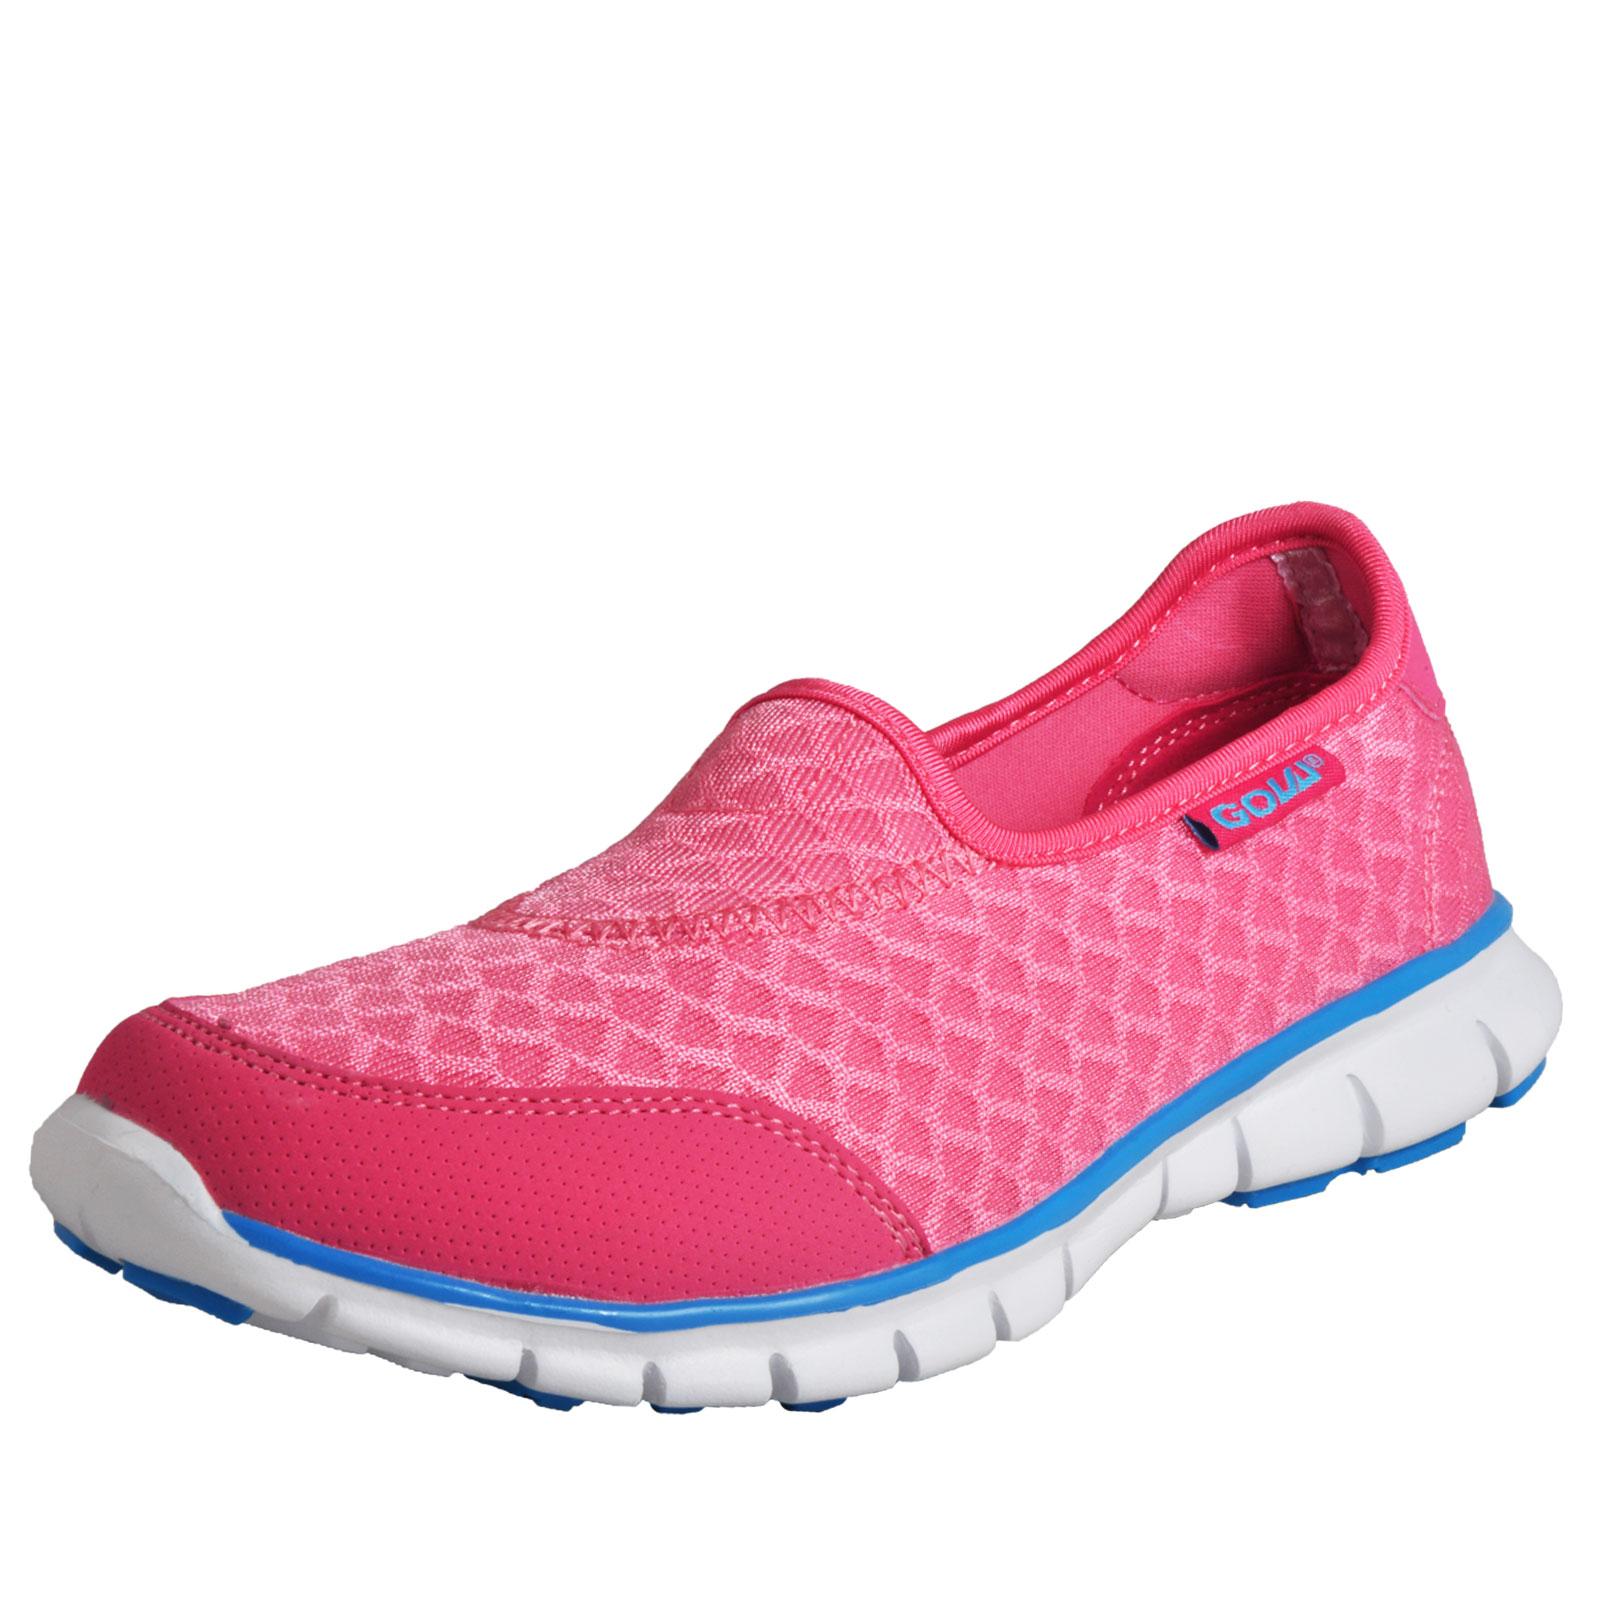 Details about Gola Mystic 2 Womens Classic Casual Slip On Memory Foam  Plimsoll Pumps Pink e8963ada4